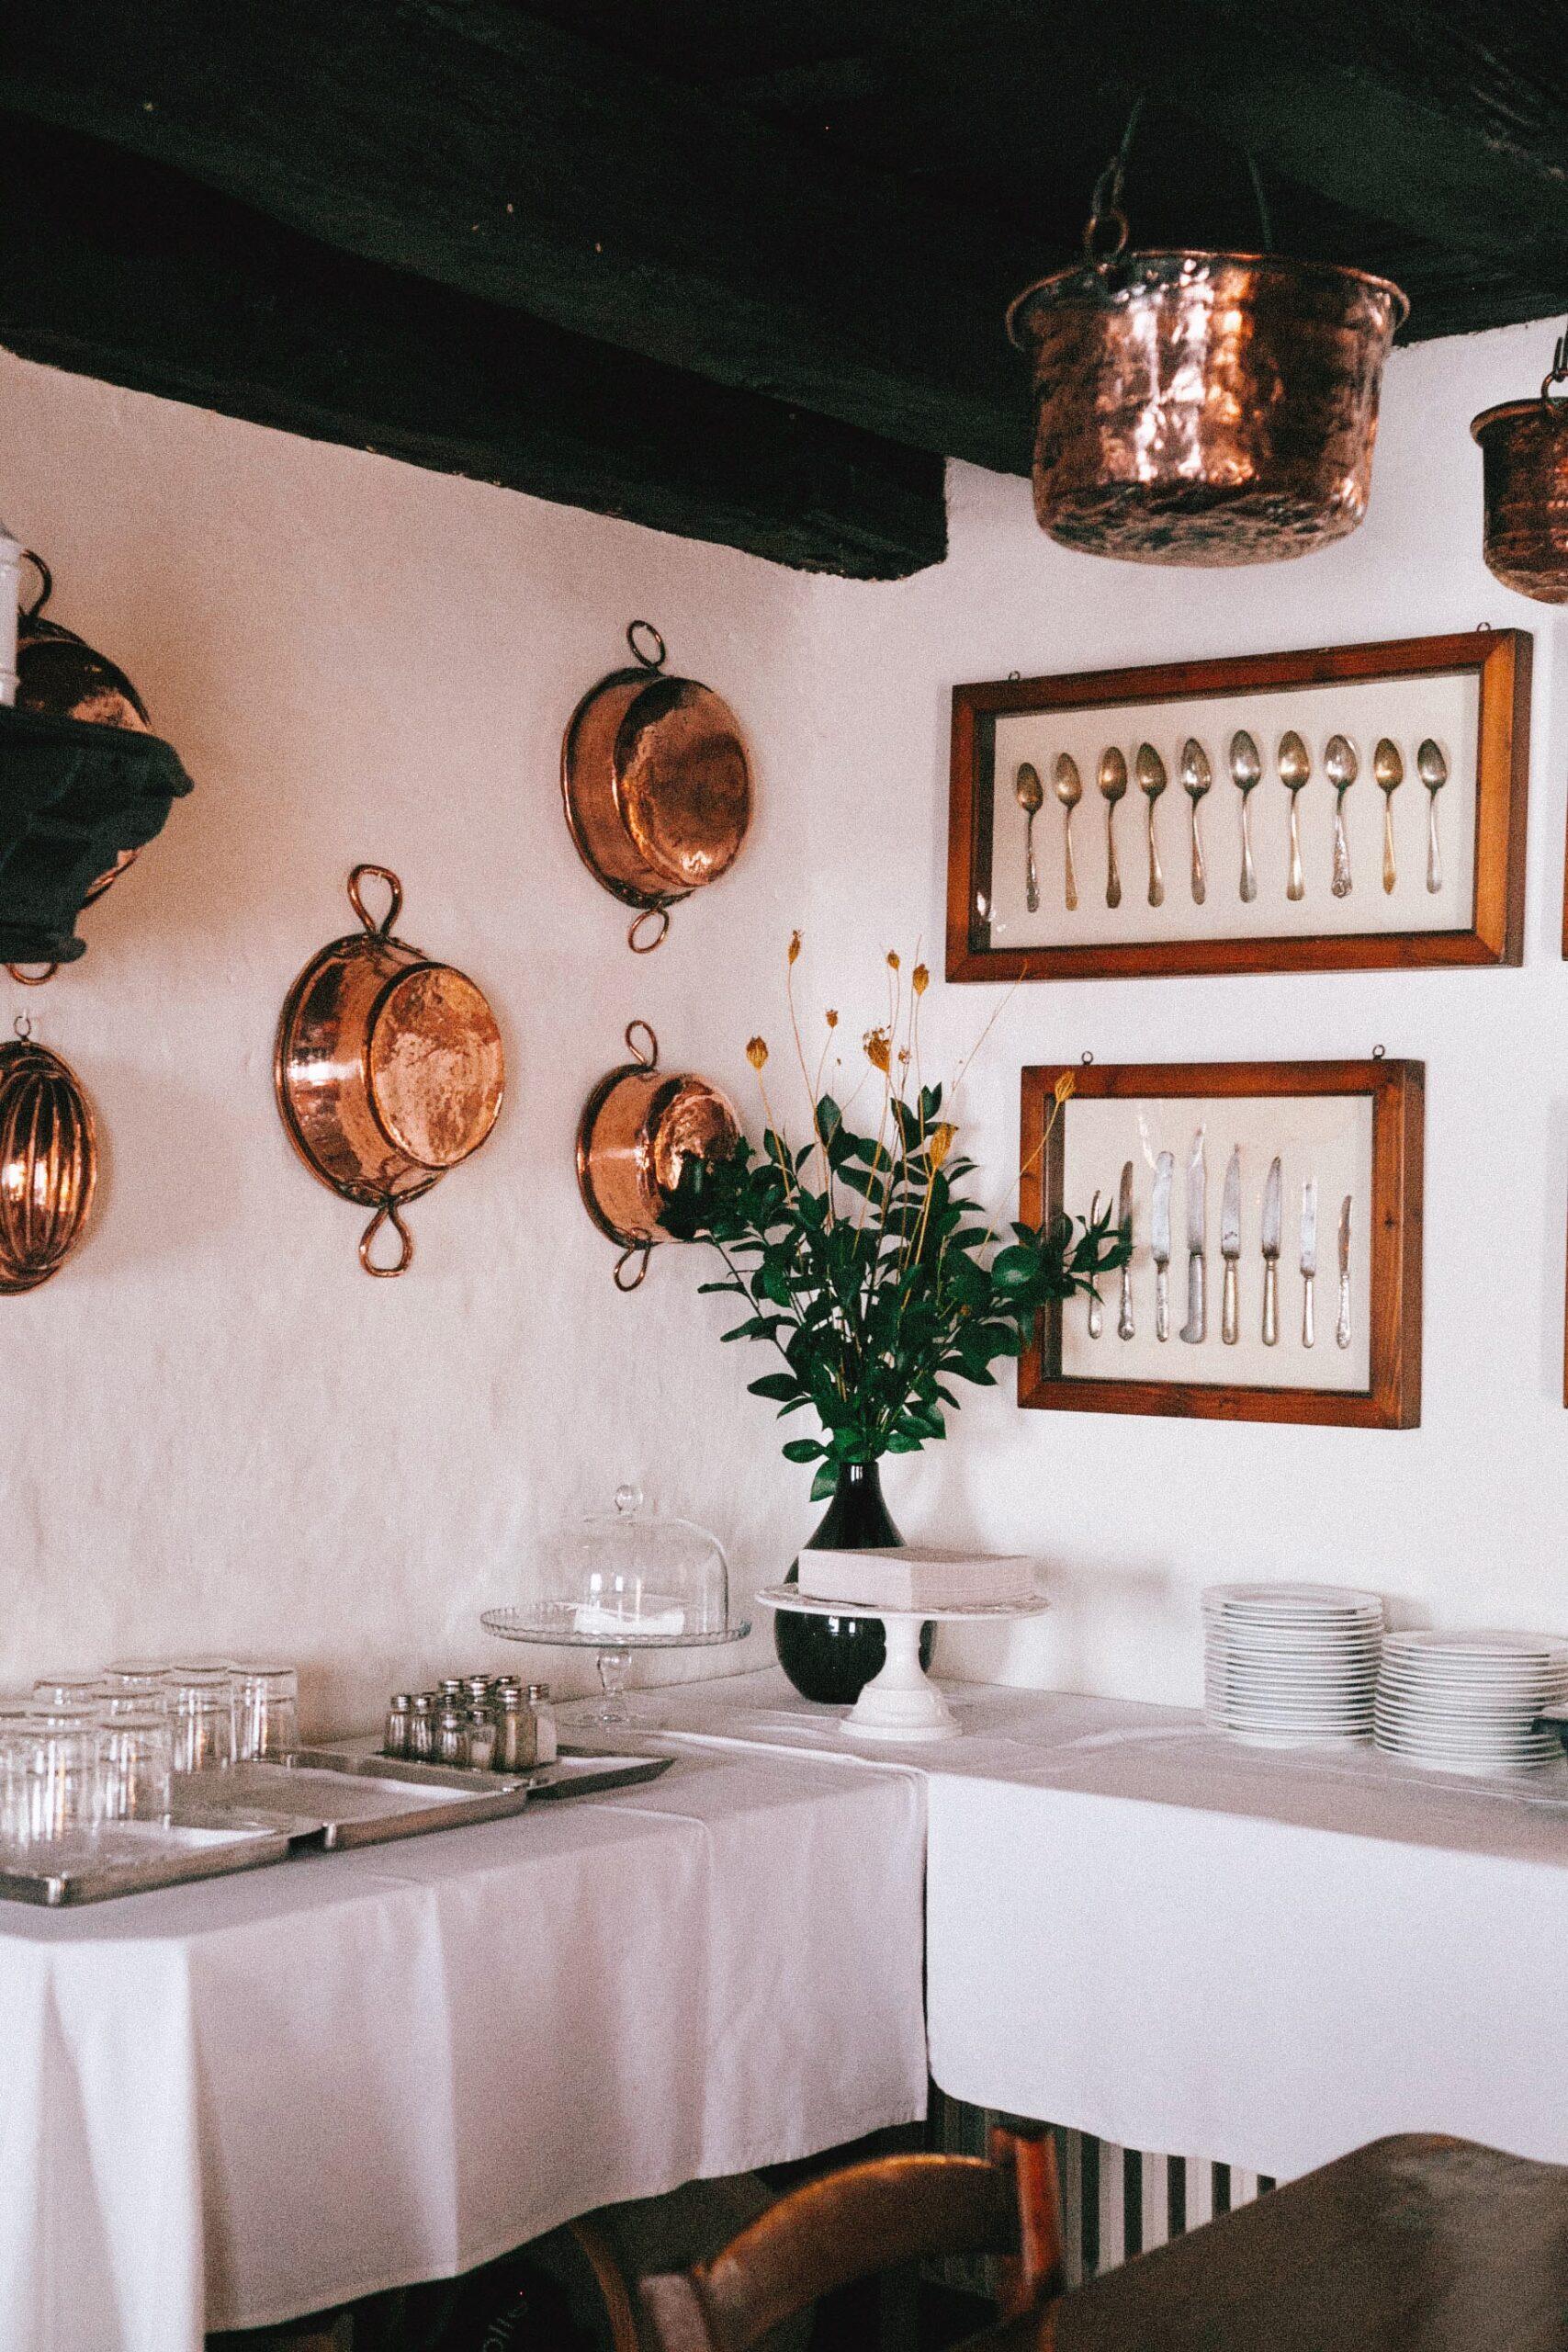 antica cucina Duca di Dolle